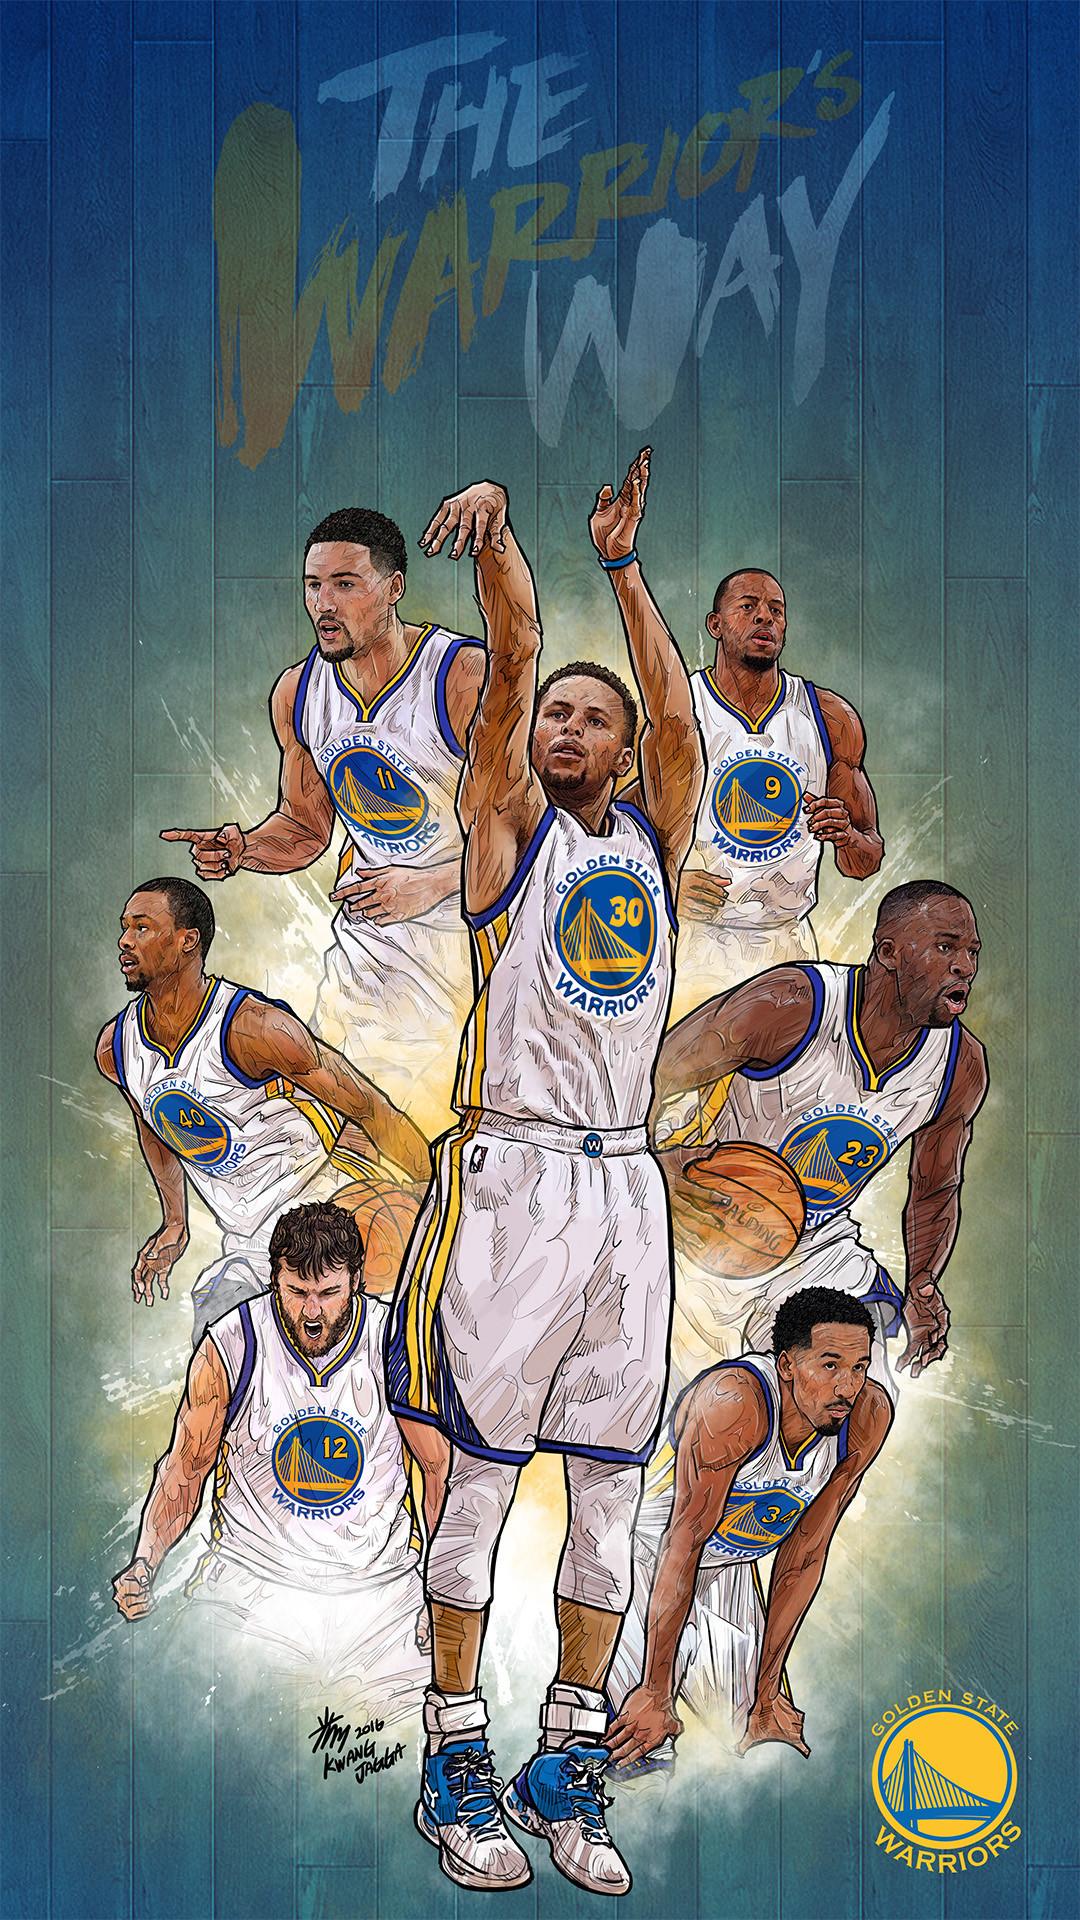 Best 25+ Stephen curry wallpaper hd ideas on Pinterest | Gsw warriors, Curry  wallpaper and Gsw nba